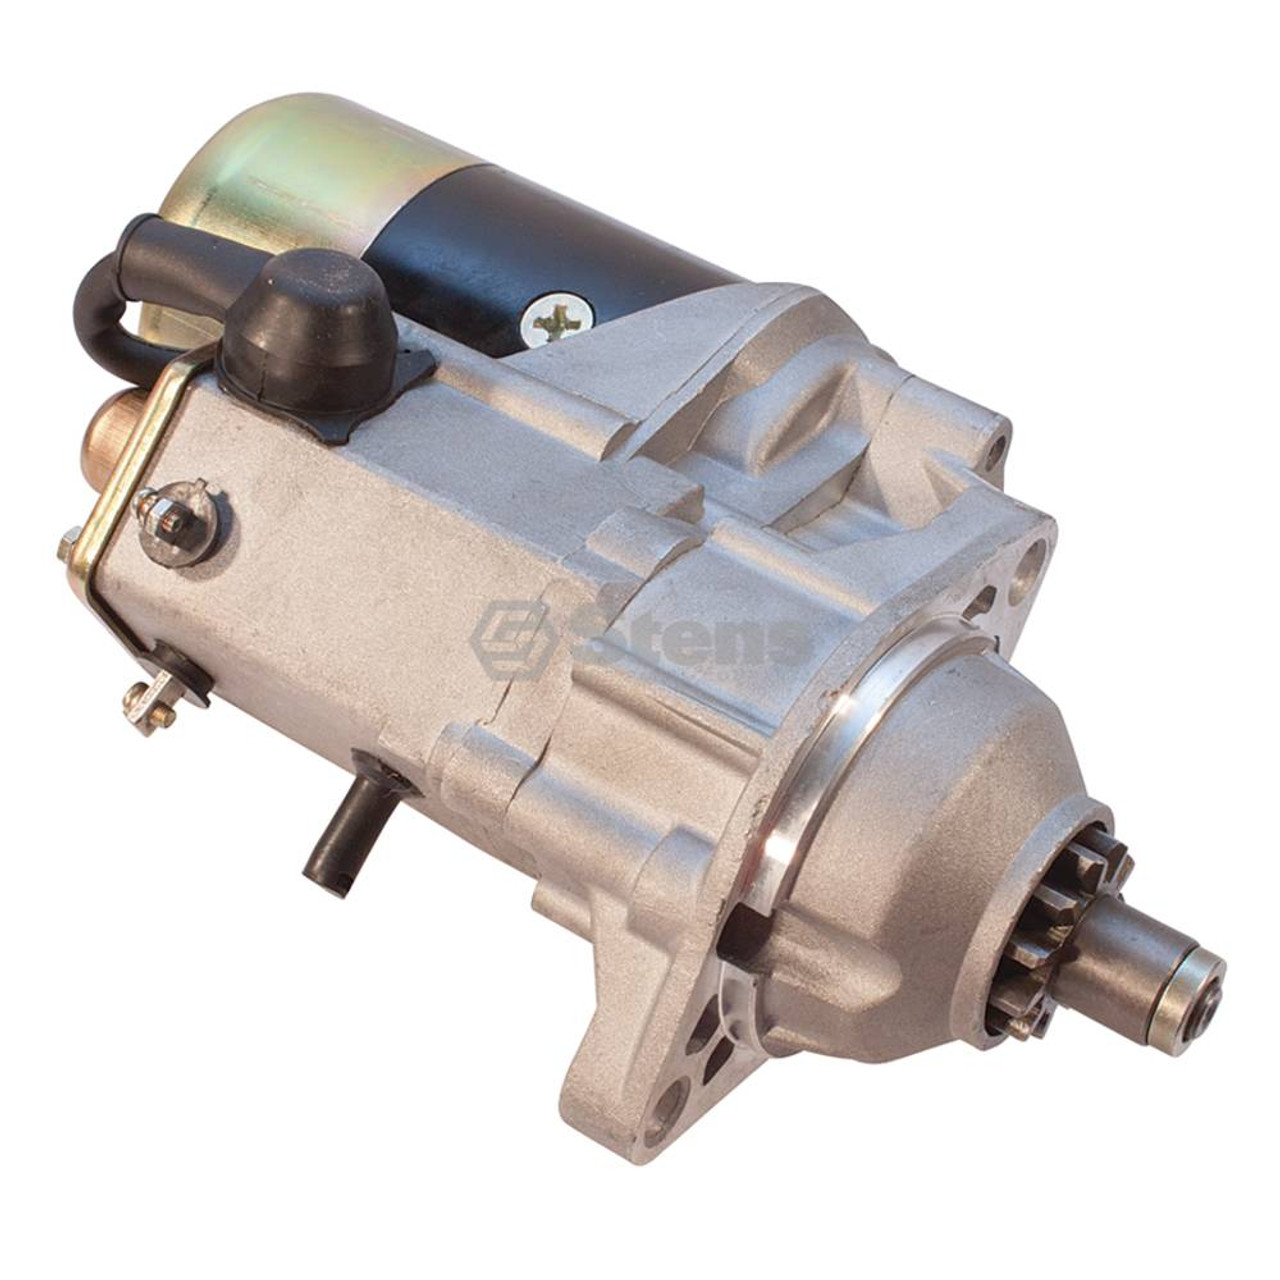 Electric Starter for Bobcat 5600 Tool Cat, 643, 645, 743, 743B, 743DS, 751,  751F, 751G, 753, 753C, 753F, 753G, 753H, 753HC, 753L, 763, 763C, 763F,